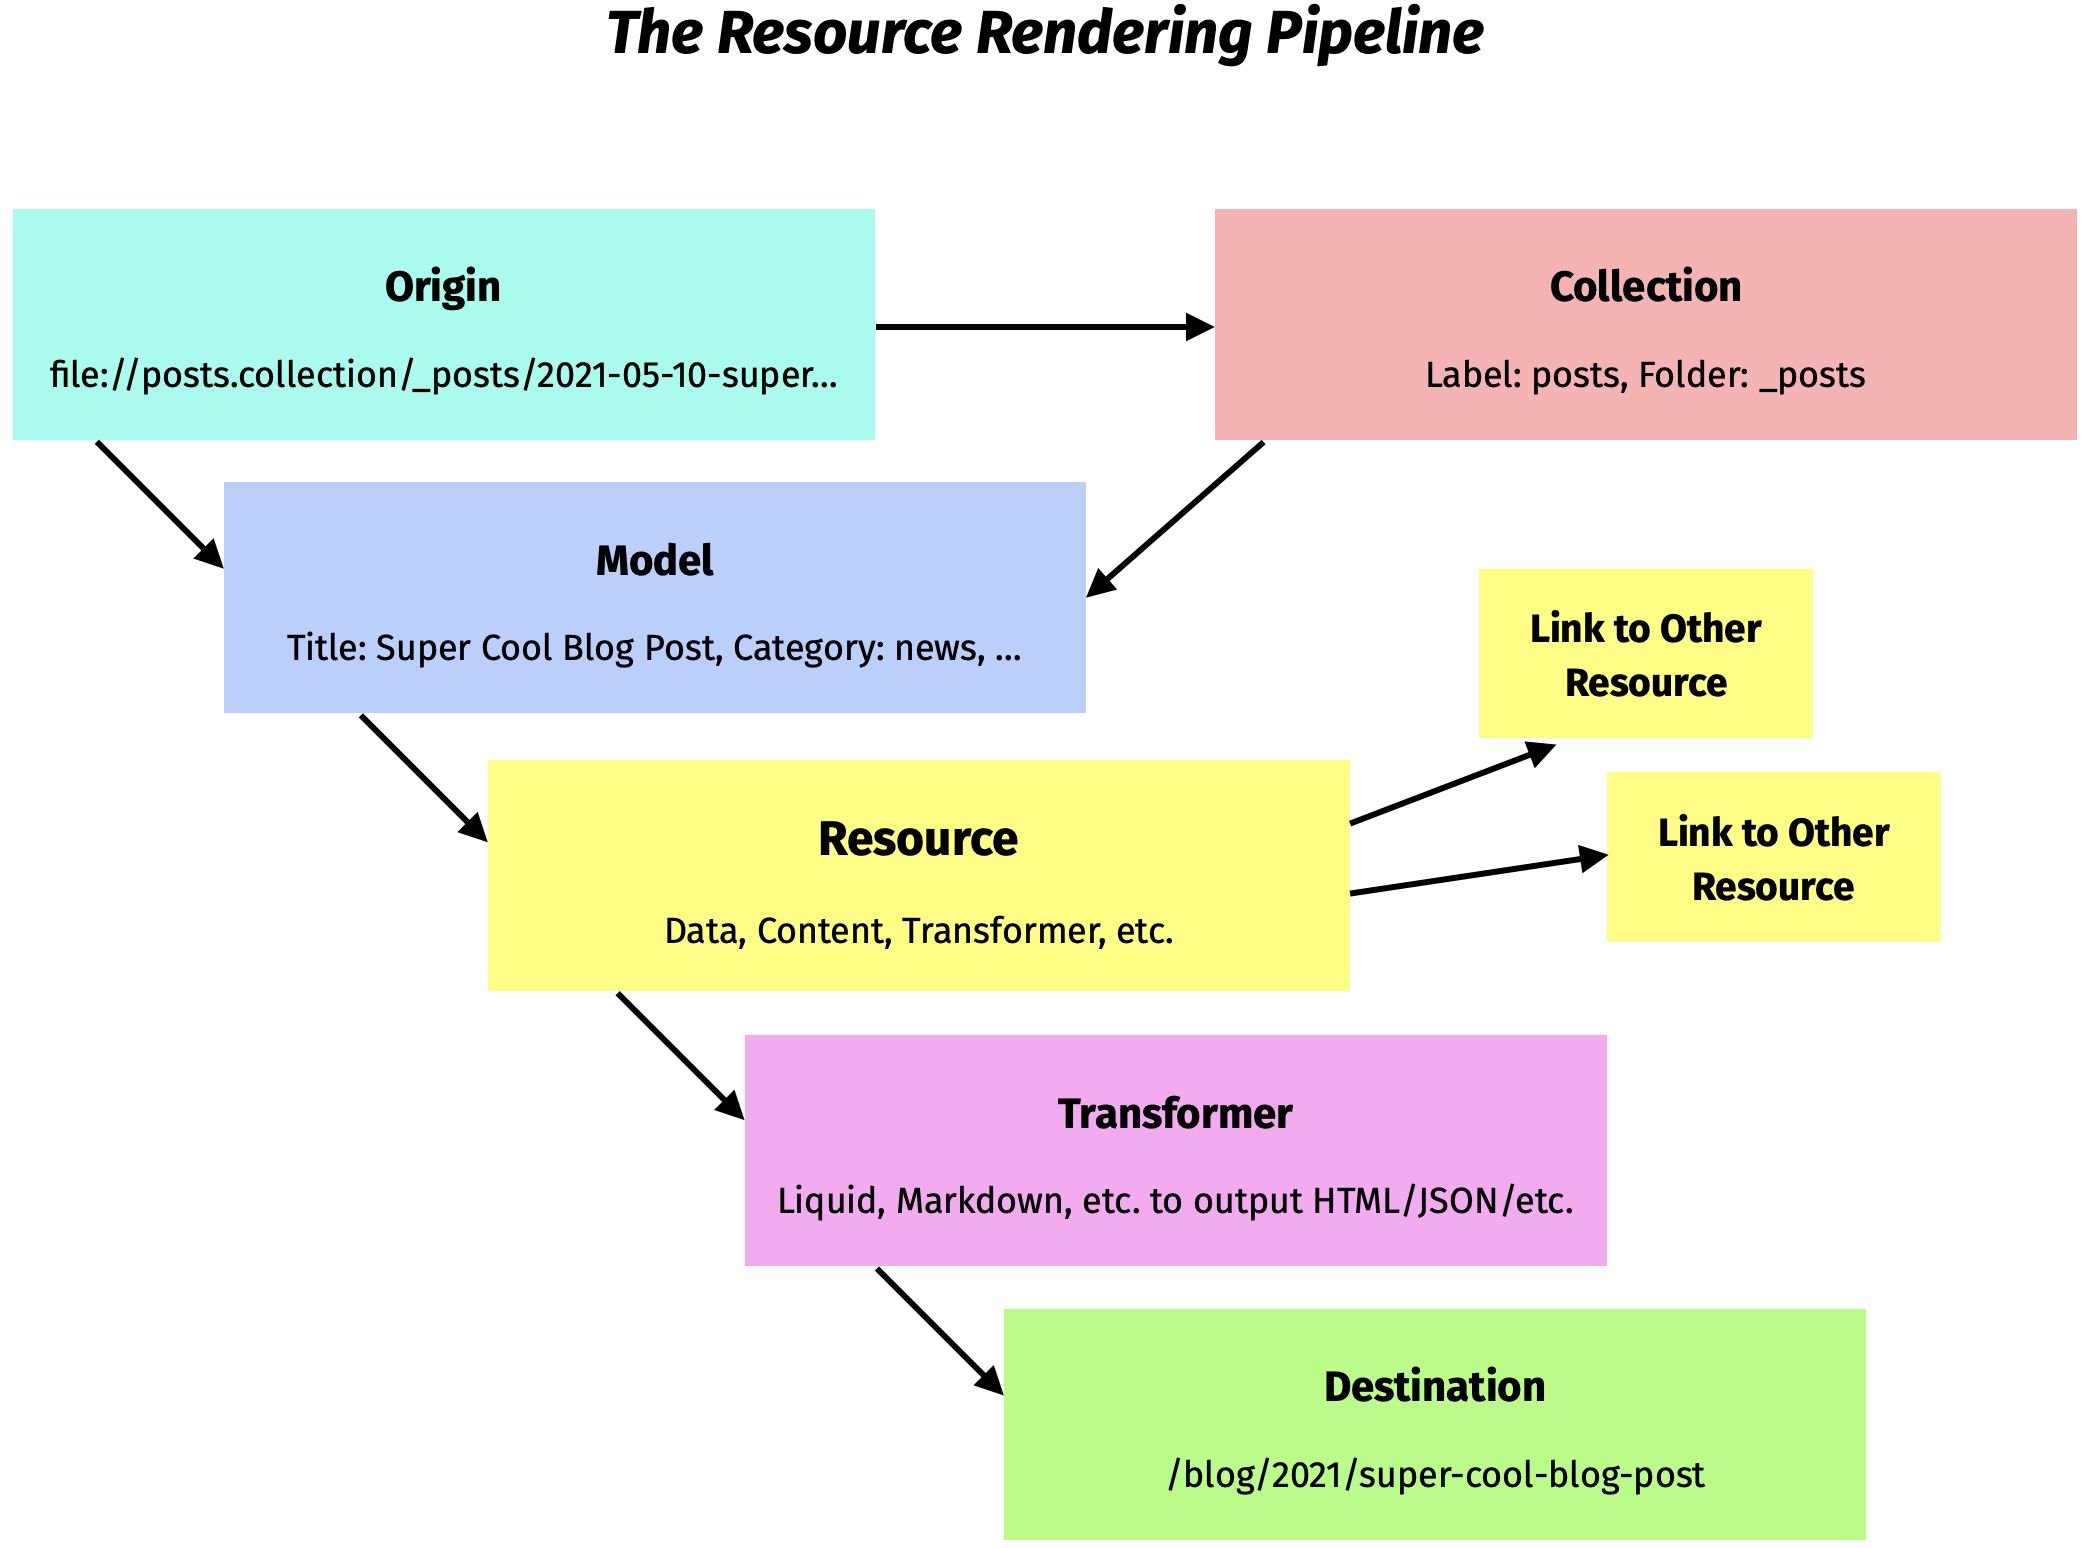 The Resource Rendering Pipeline